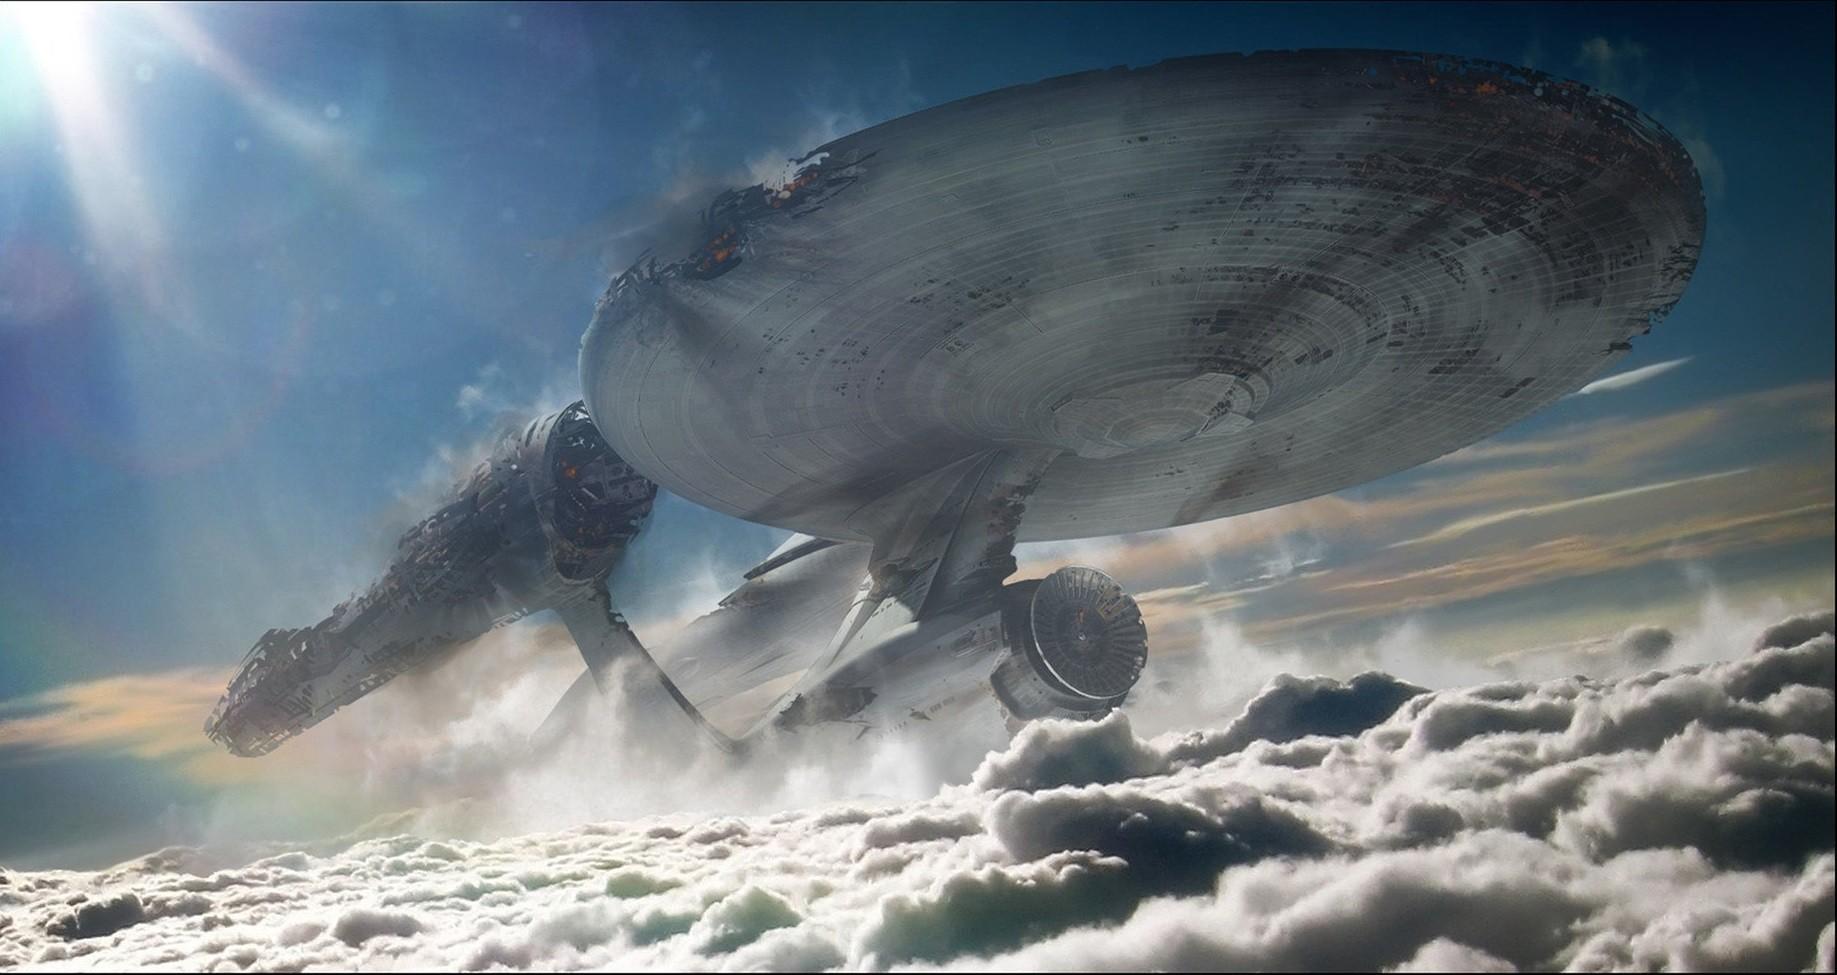 General 1837x975 Star Trek Star Trek: Enterprise spaceship vehicle Star Trek Ships movies digital art